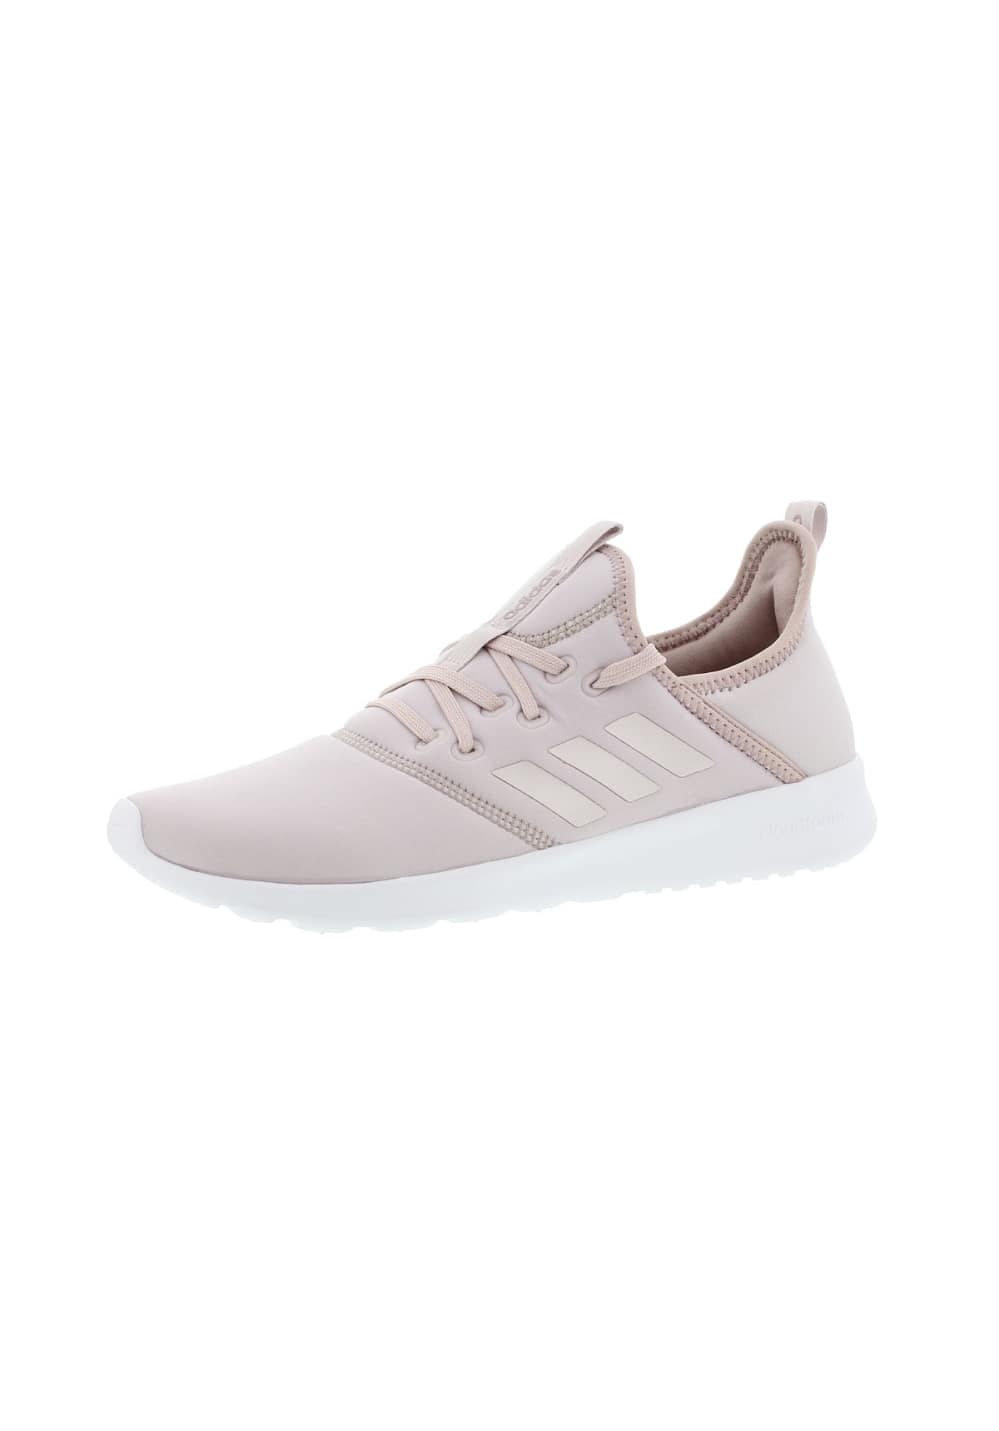 d1dffcf5fd adidas neo Cloudfoam Pure - Zapatillas de running para Mujer - Rosa ...